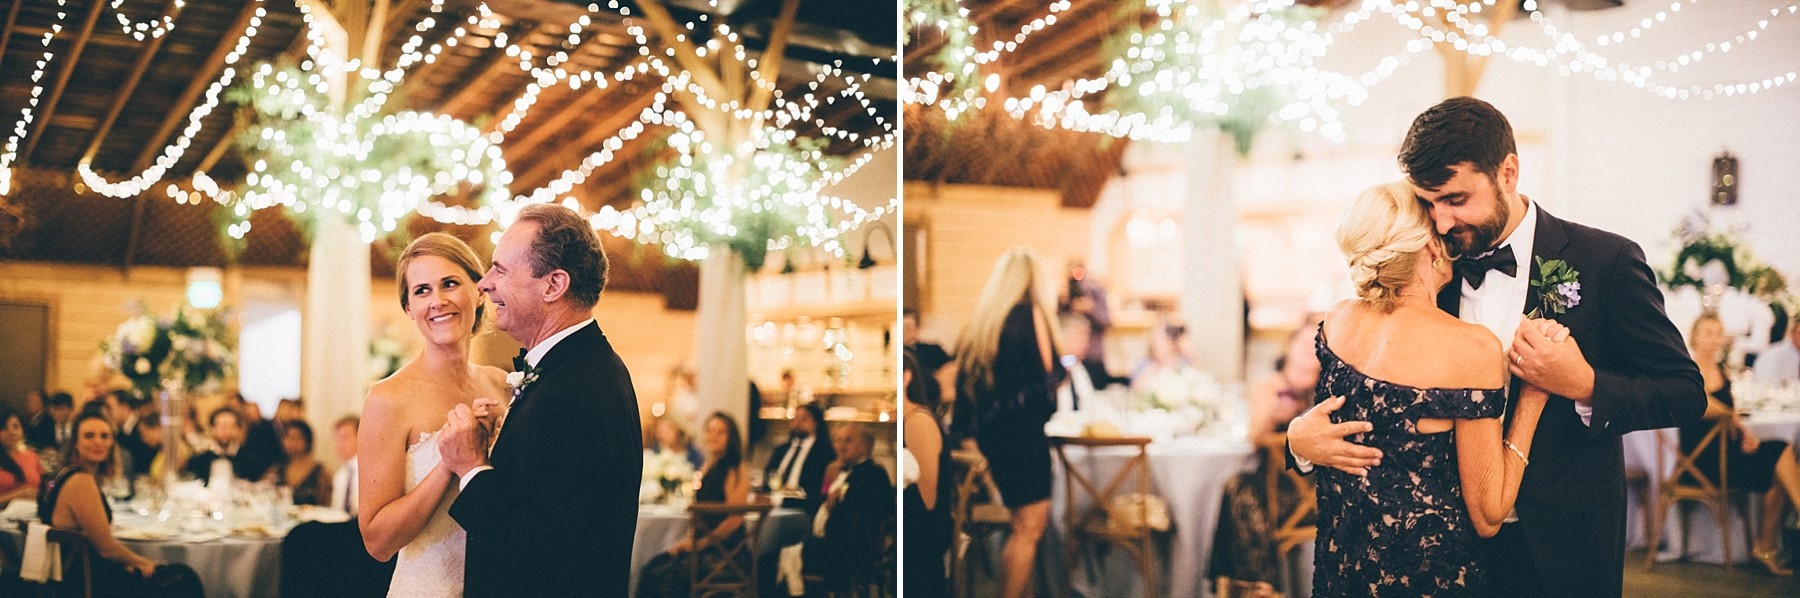 north-carolina-fearrington-village-wedding-photographer-destination_0063.jpg